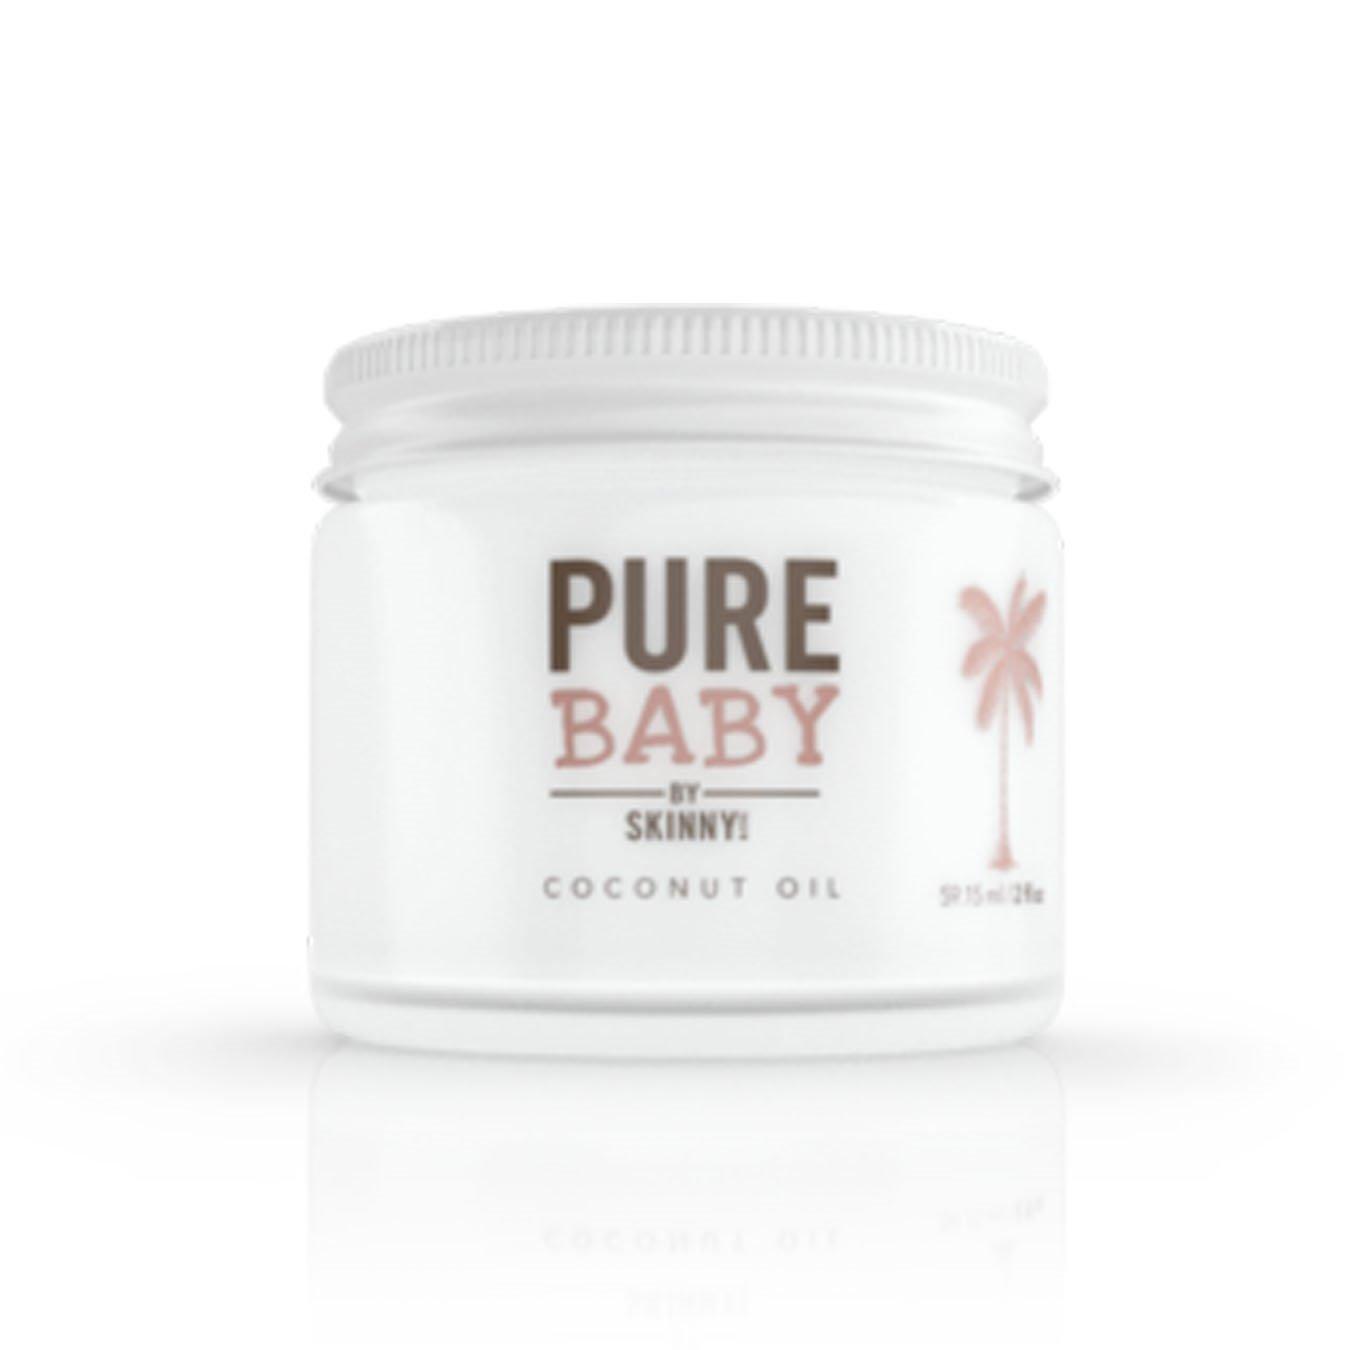 Skinny & Co. Pure Baby Coconut Oil (2 oz.)